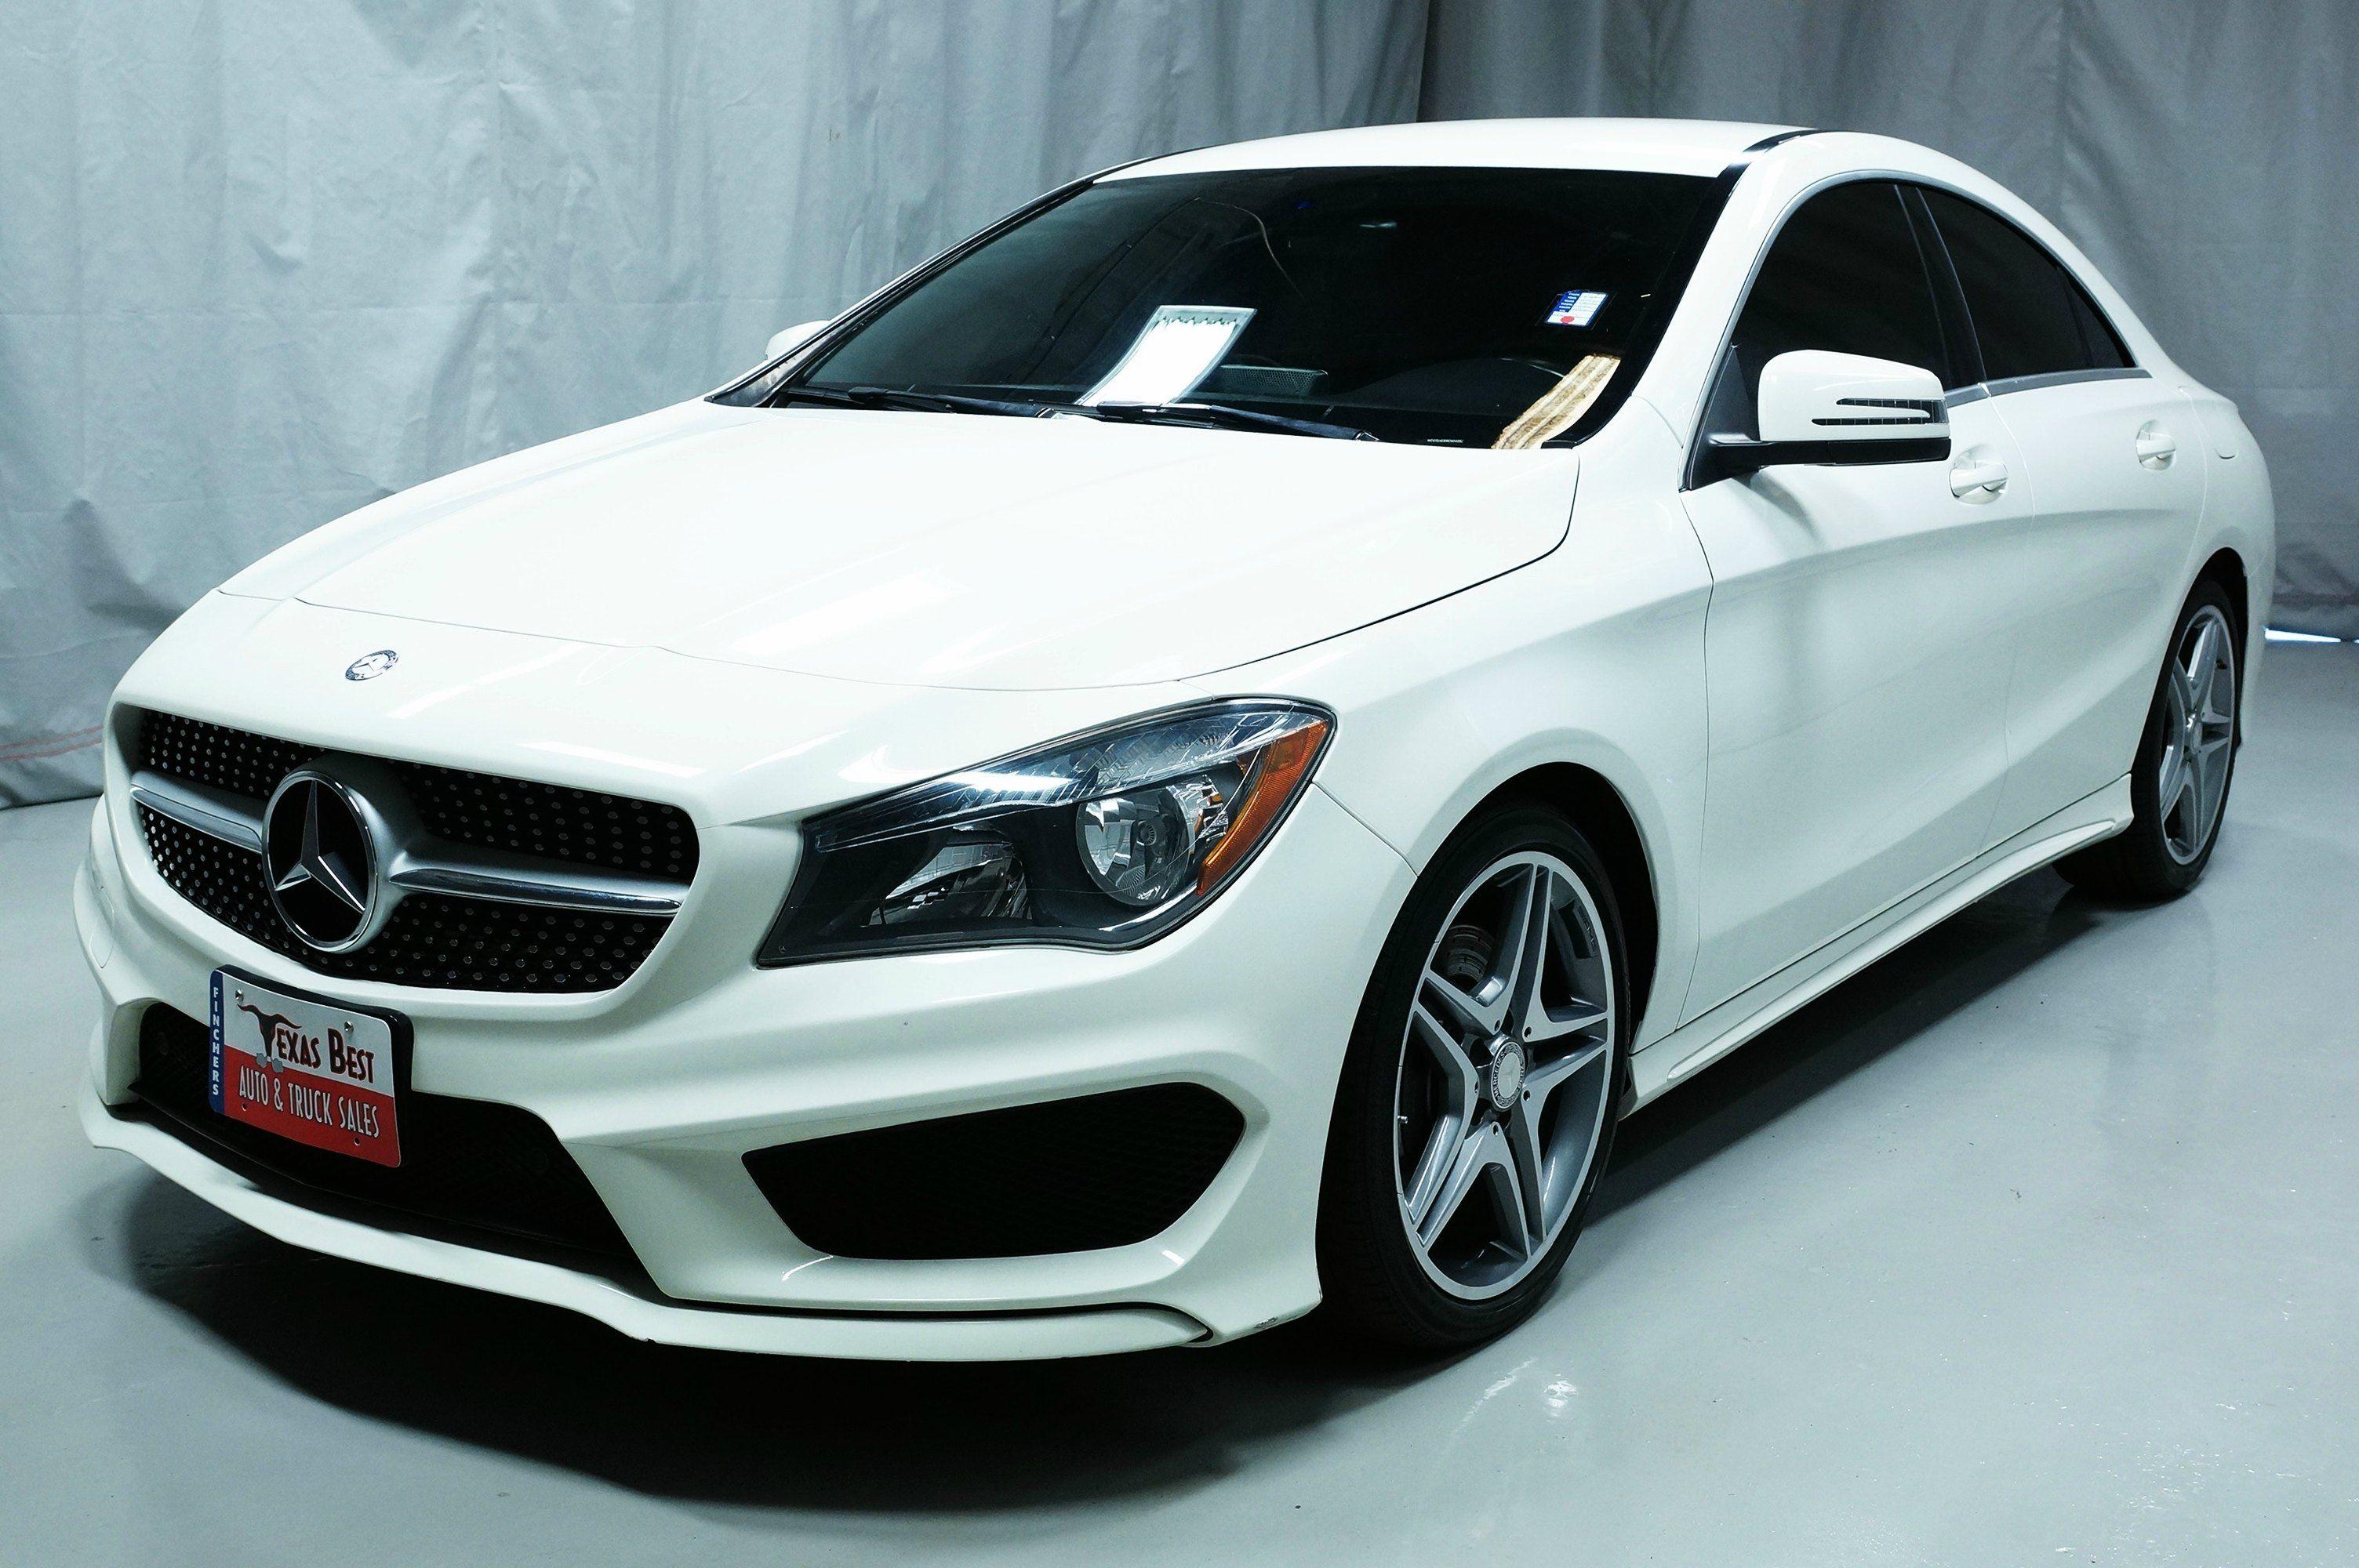 High Quality 2014 #MercedesBenz CLA Class #CLA250 For Sale In #Houston, Texas.